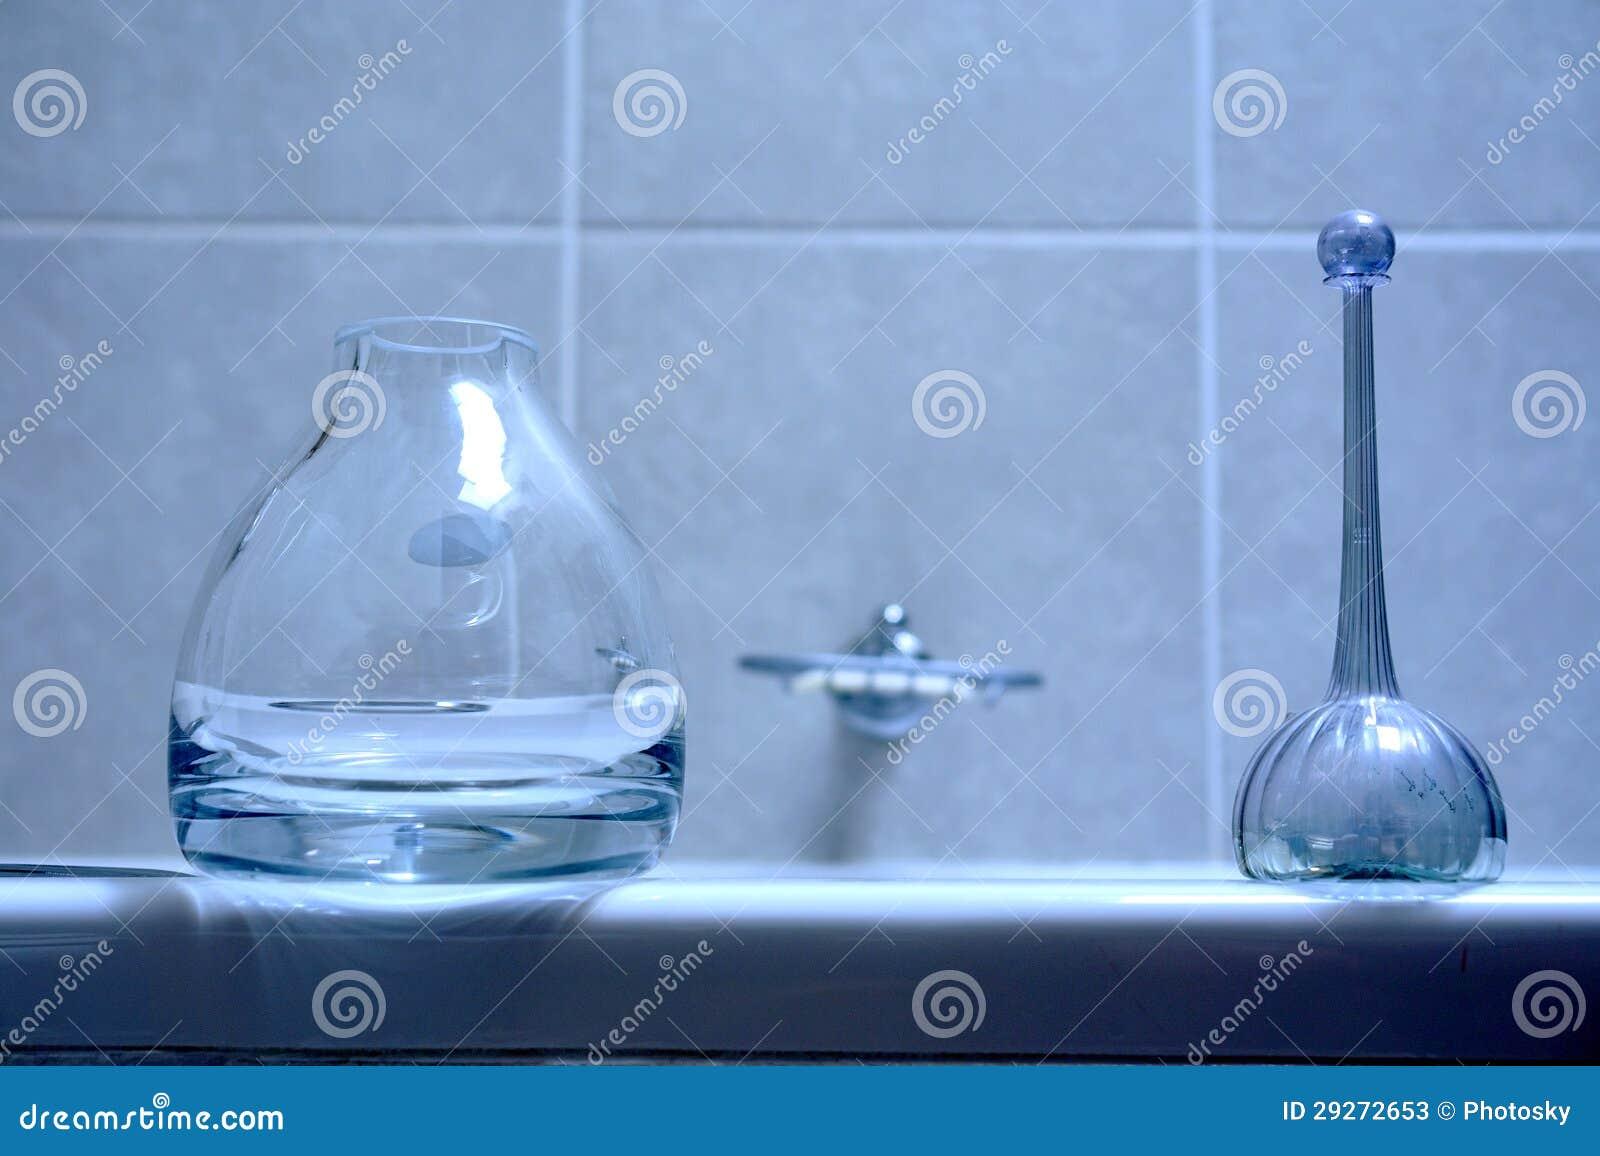 Two glass bottles in bathroom stock photos image 29272653 for Bathroom bottles